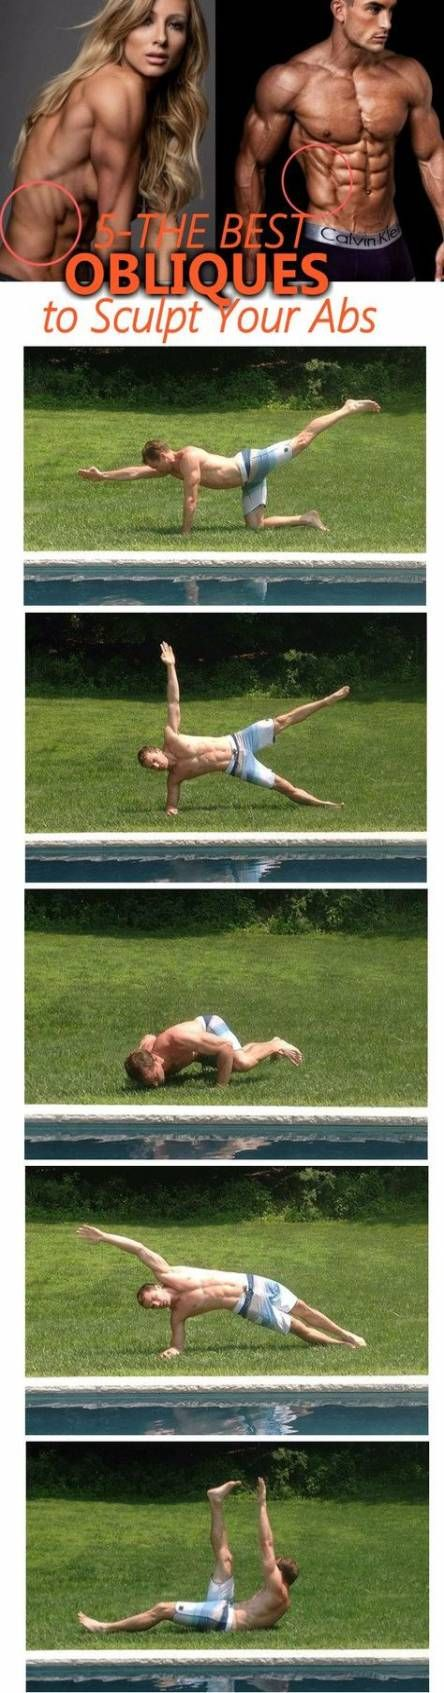 Super fitness motivation couples trains ideas #motivation #fitness